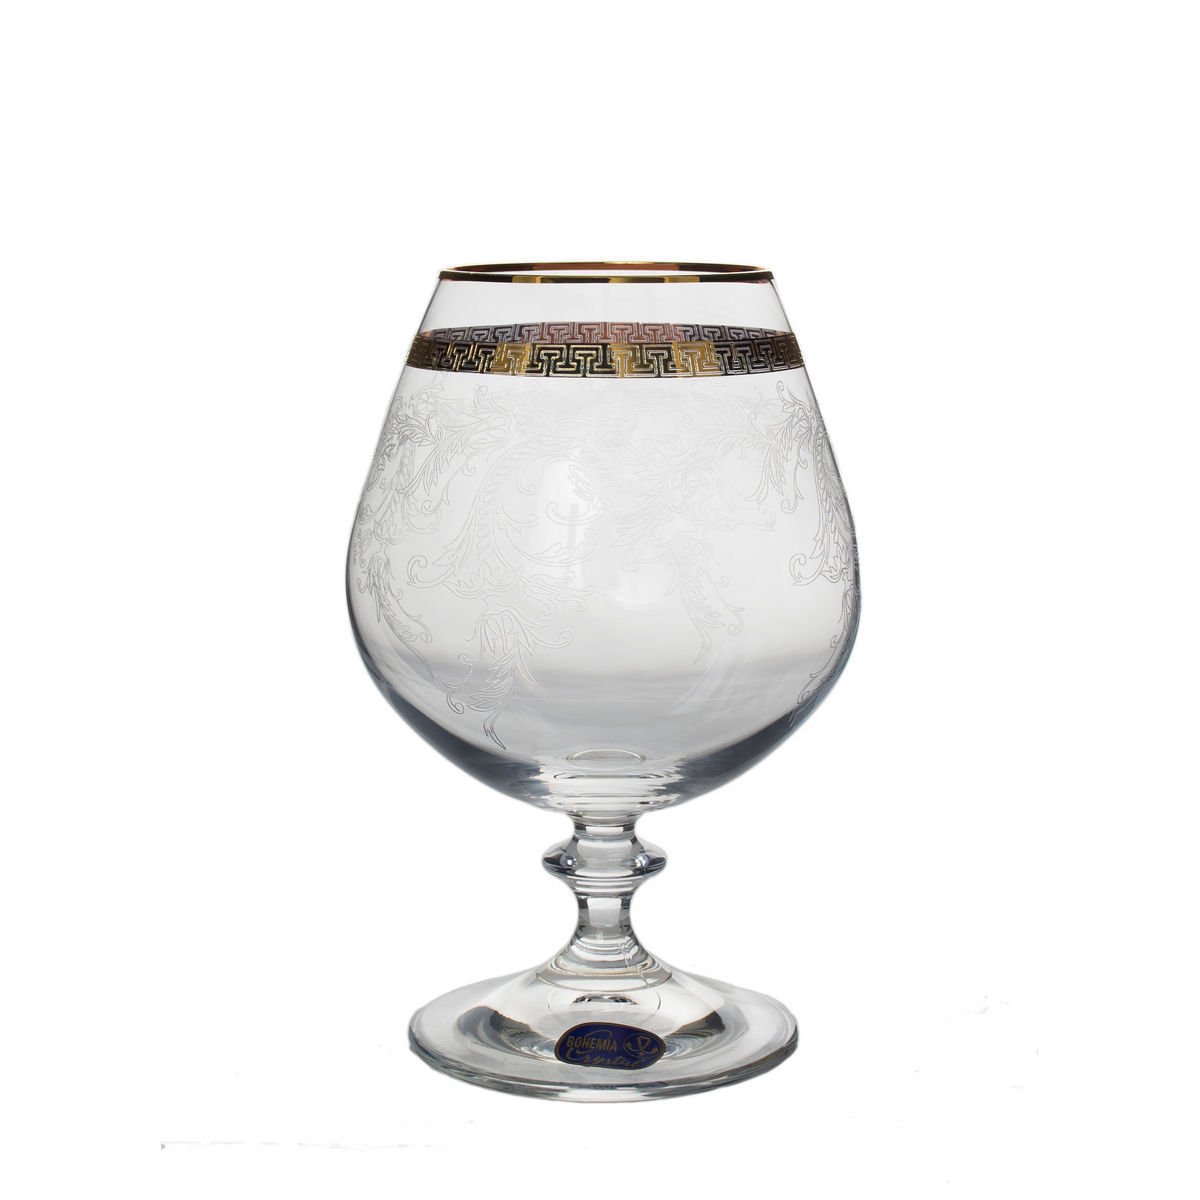 Giulia Set 6 Pahare Cristalin Decor Aur Brandy 400 Ml 2021 aranjareamesei.ro